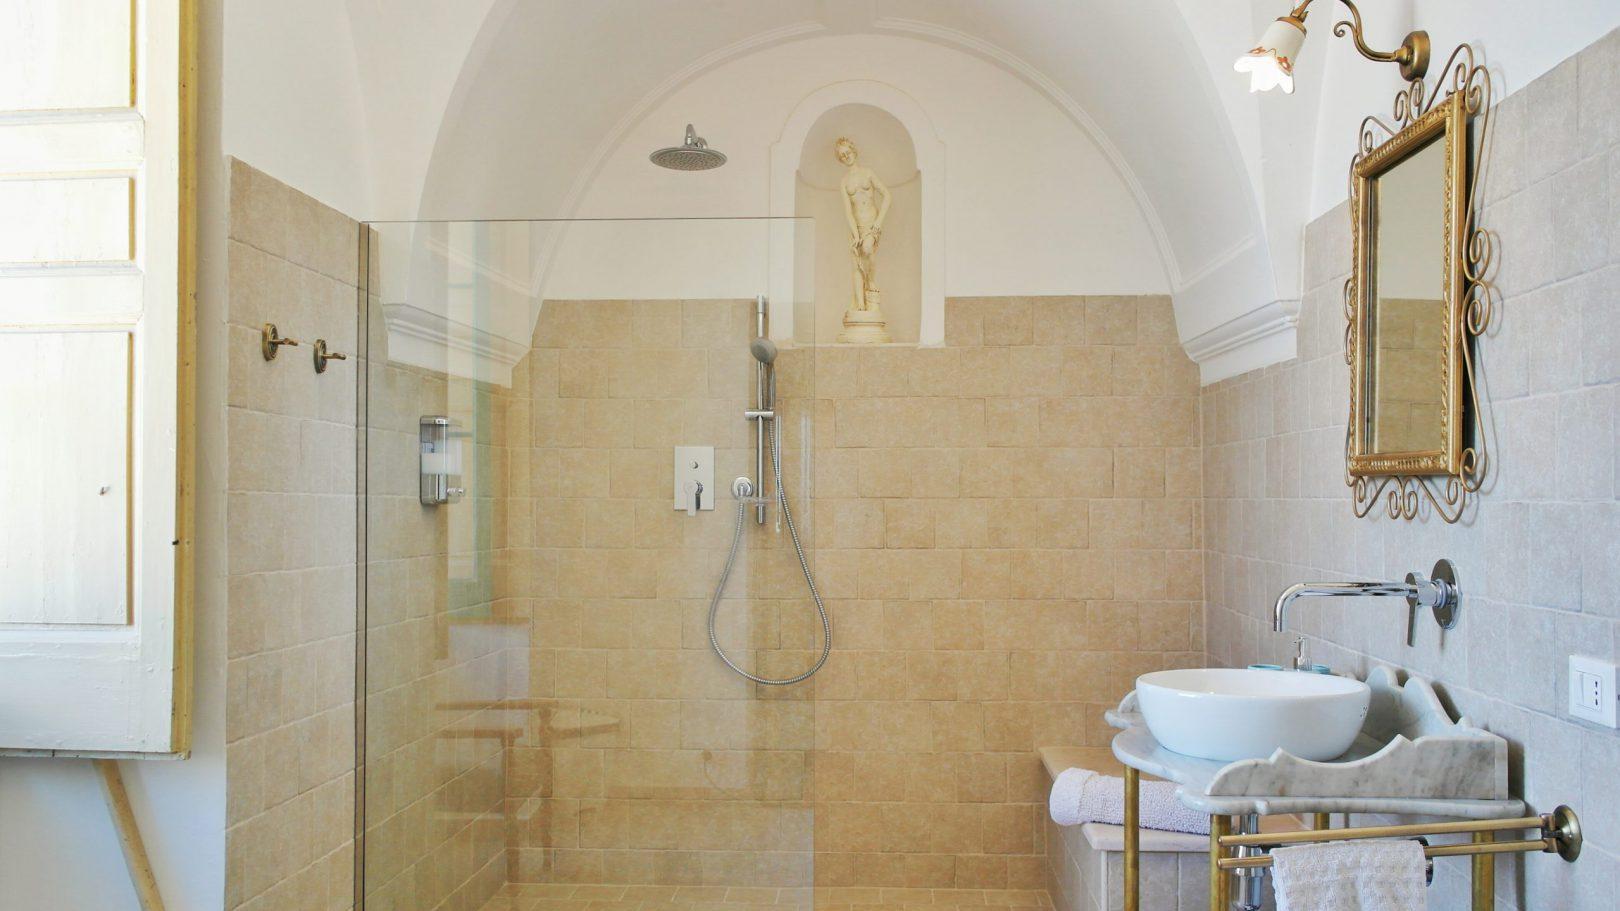 Enjoy modern bathroom facilities at Masseria Bellavista historic holiday vacation rental villa in ostuni puglia seaview with pool